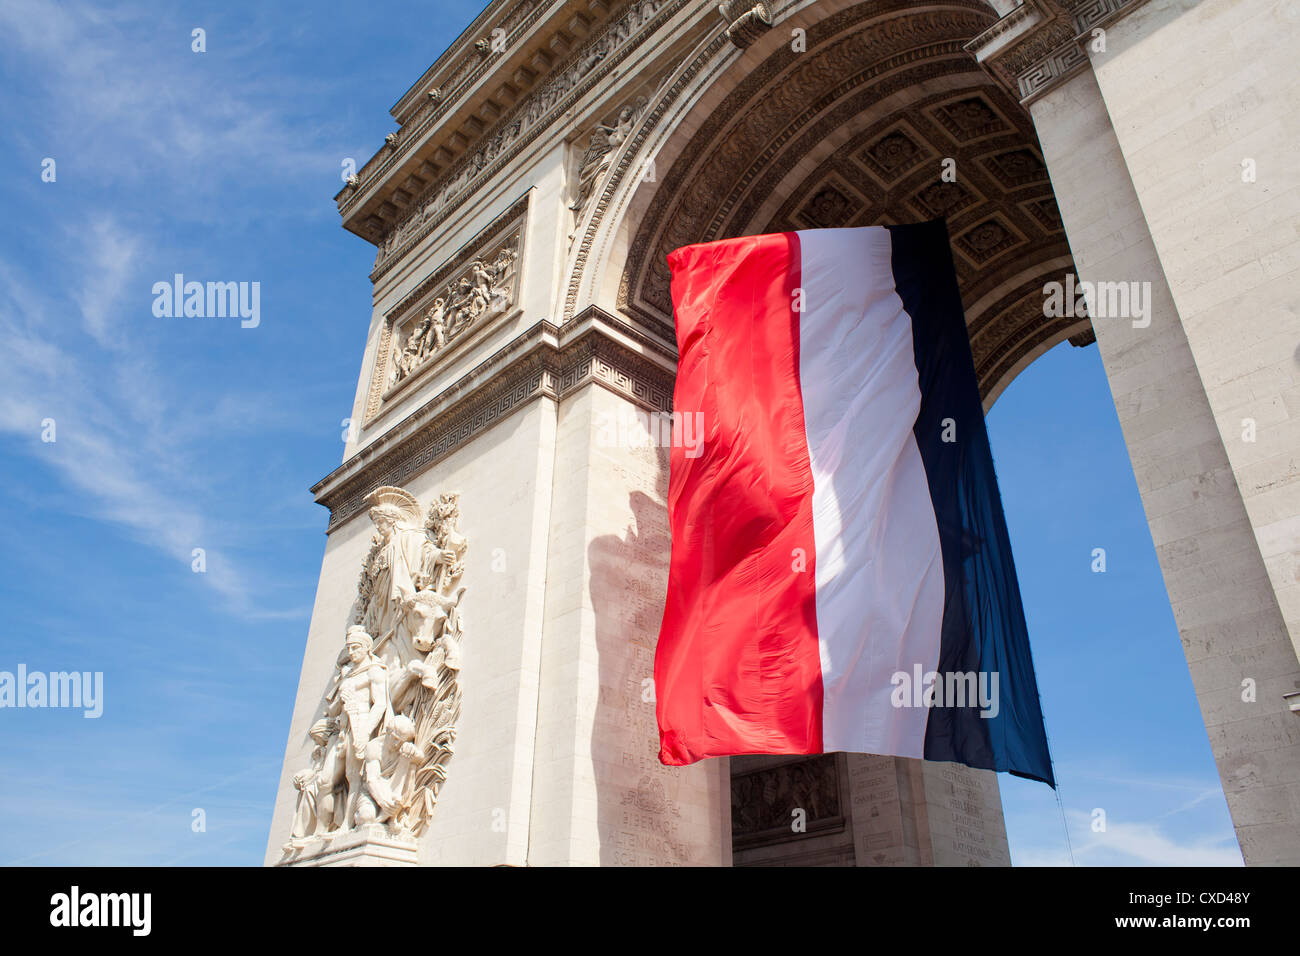 French flag under Arc de Triomphe built by Napoleon, Paris, France, Europe - Stock Image